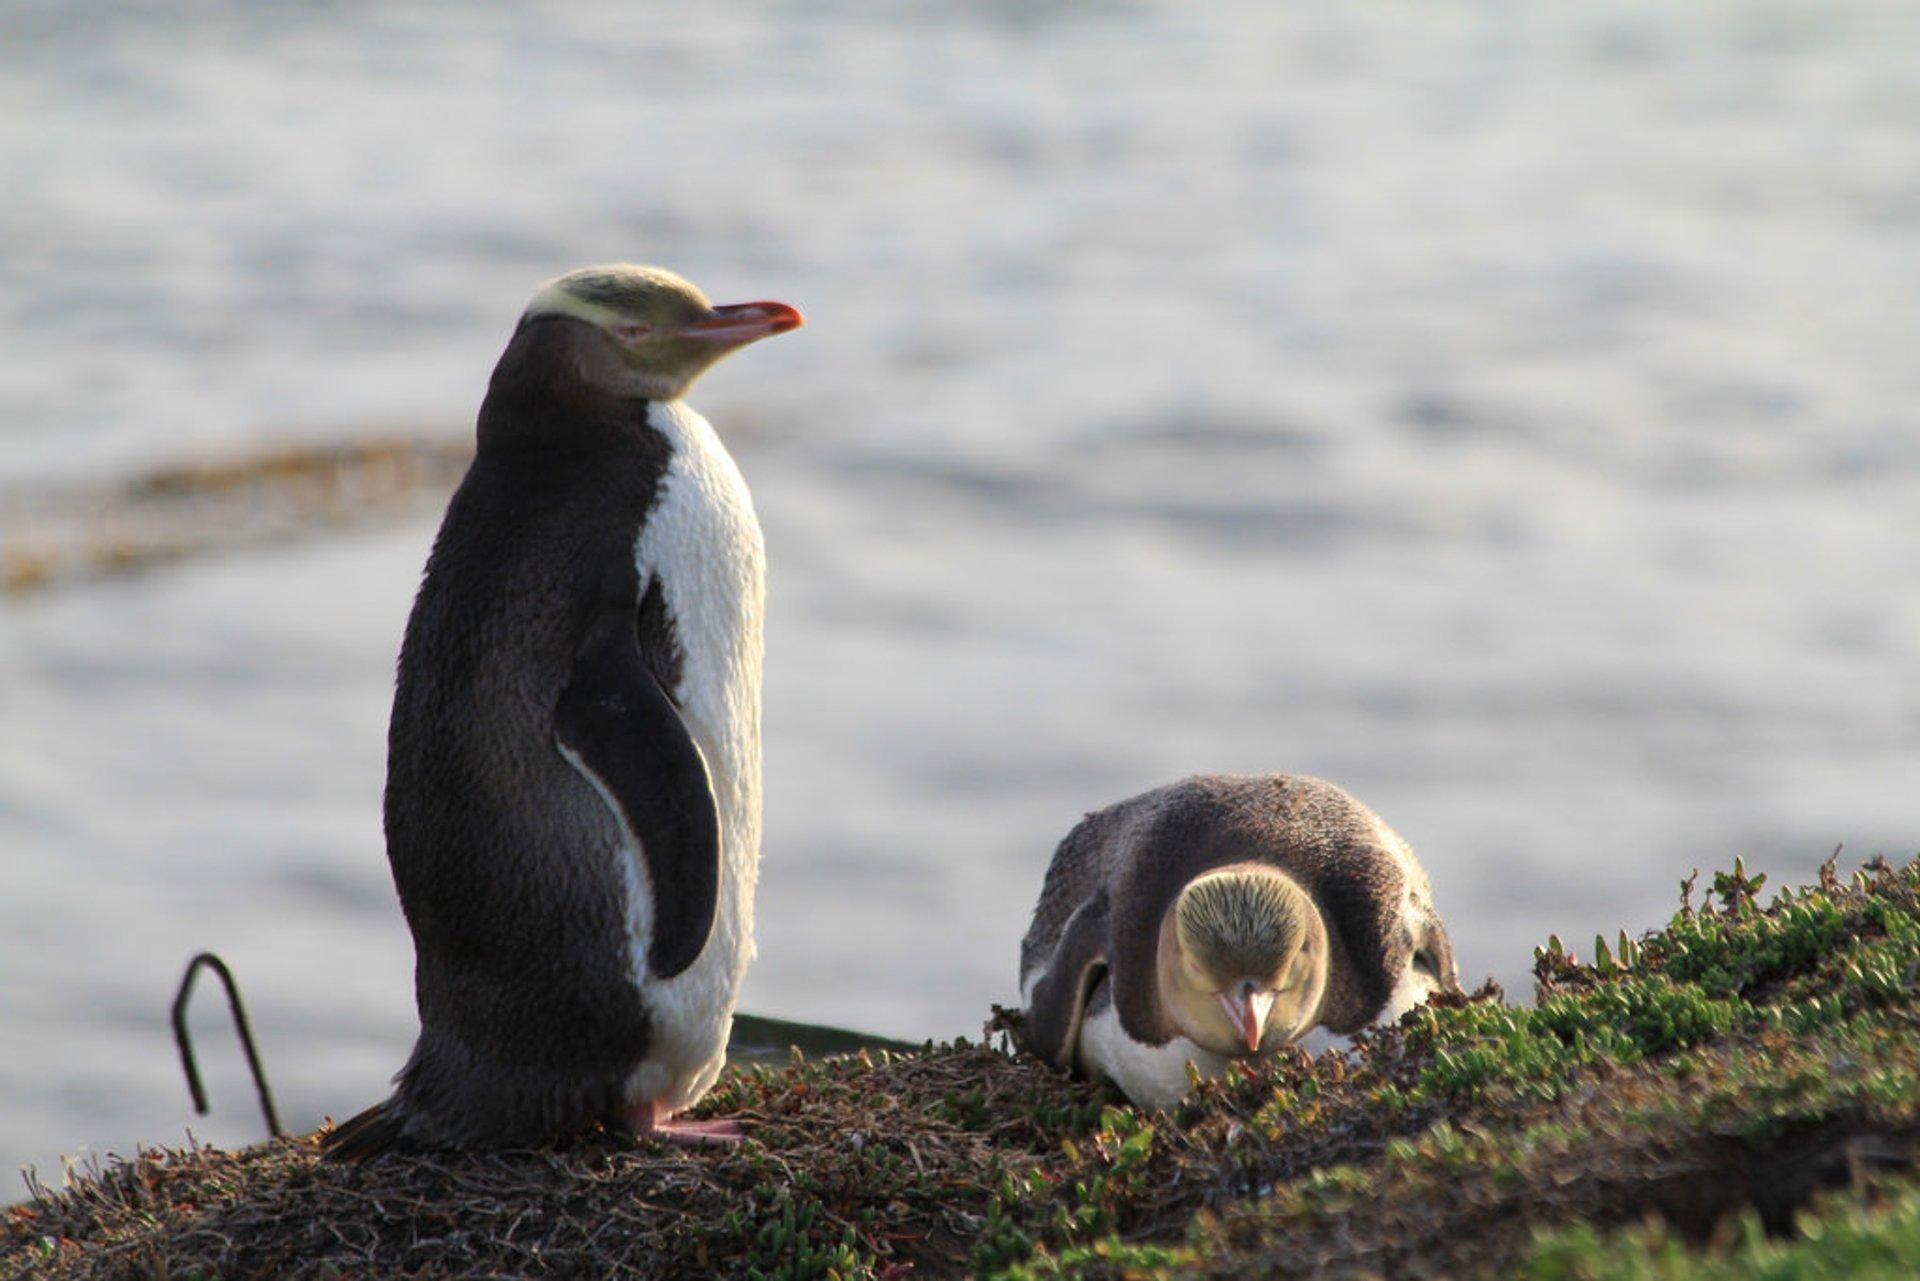 Hoiho–Yellow-Eyed Penguin in New Zealand - Best Season 2020